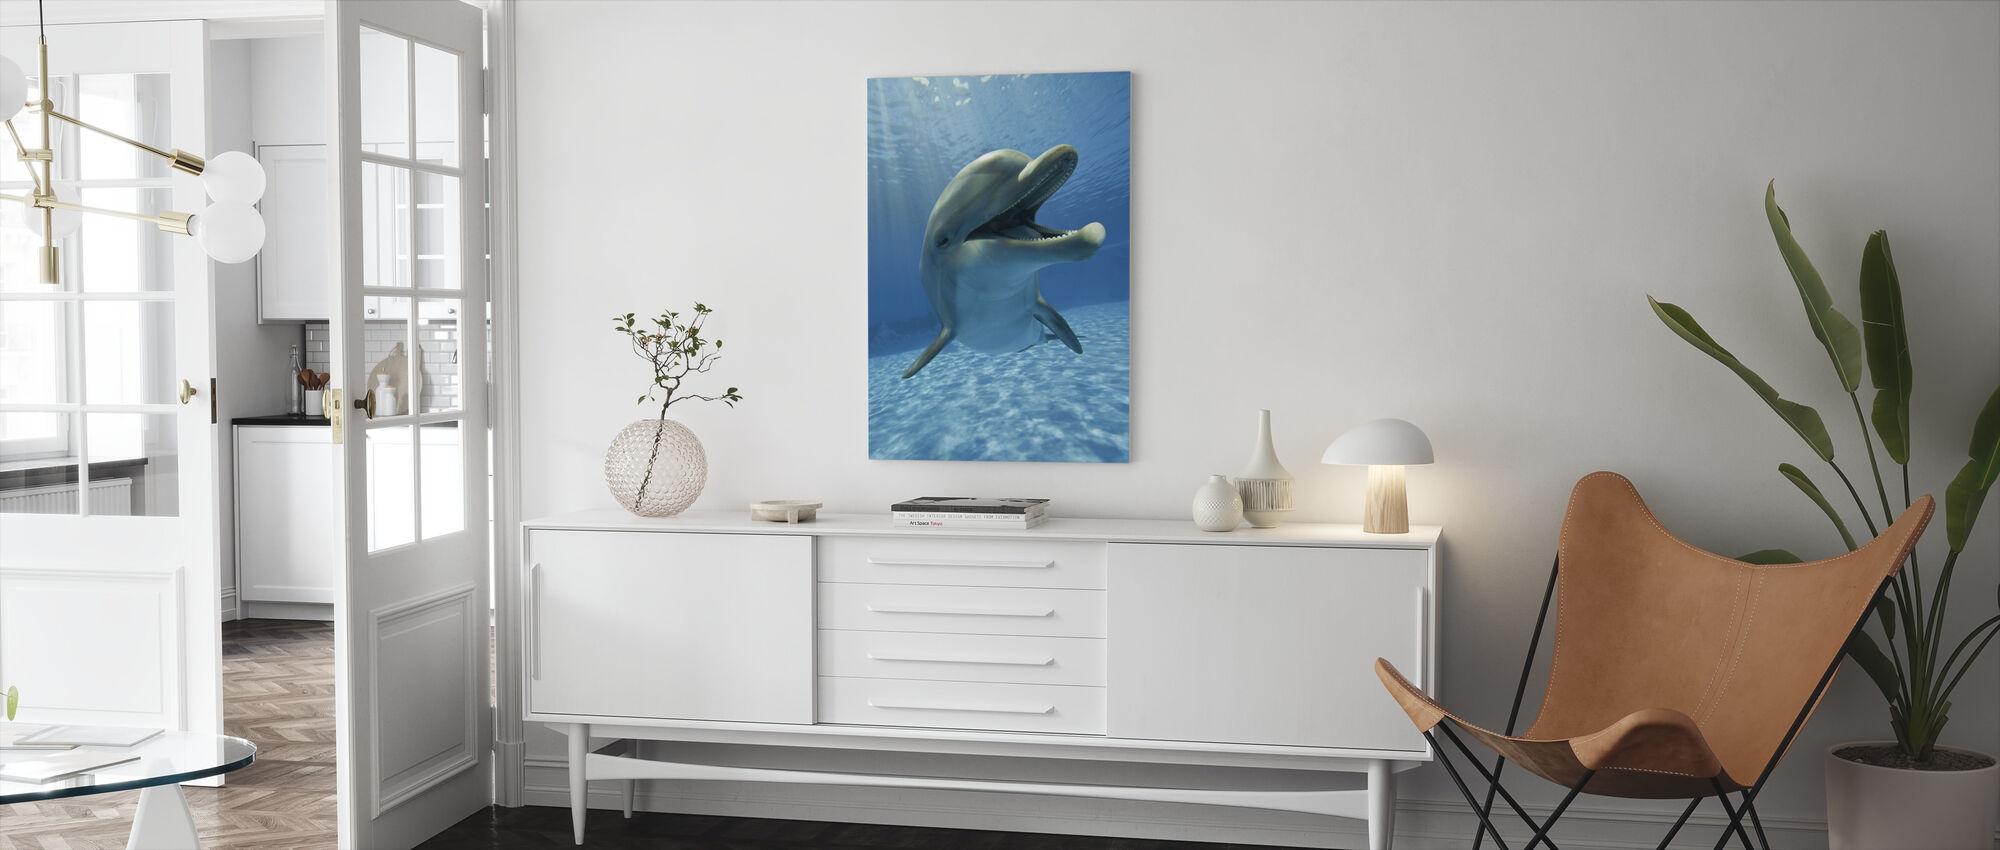 Ontmoeting met Dolfijn - Canvas print - Woonkamer